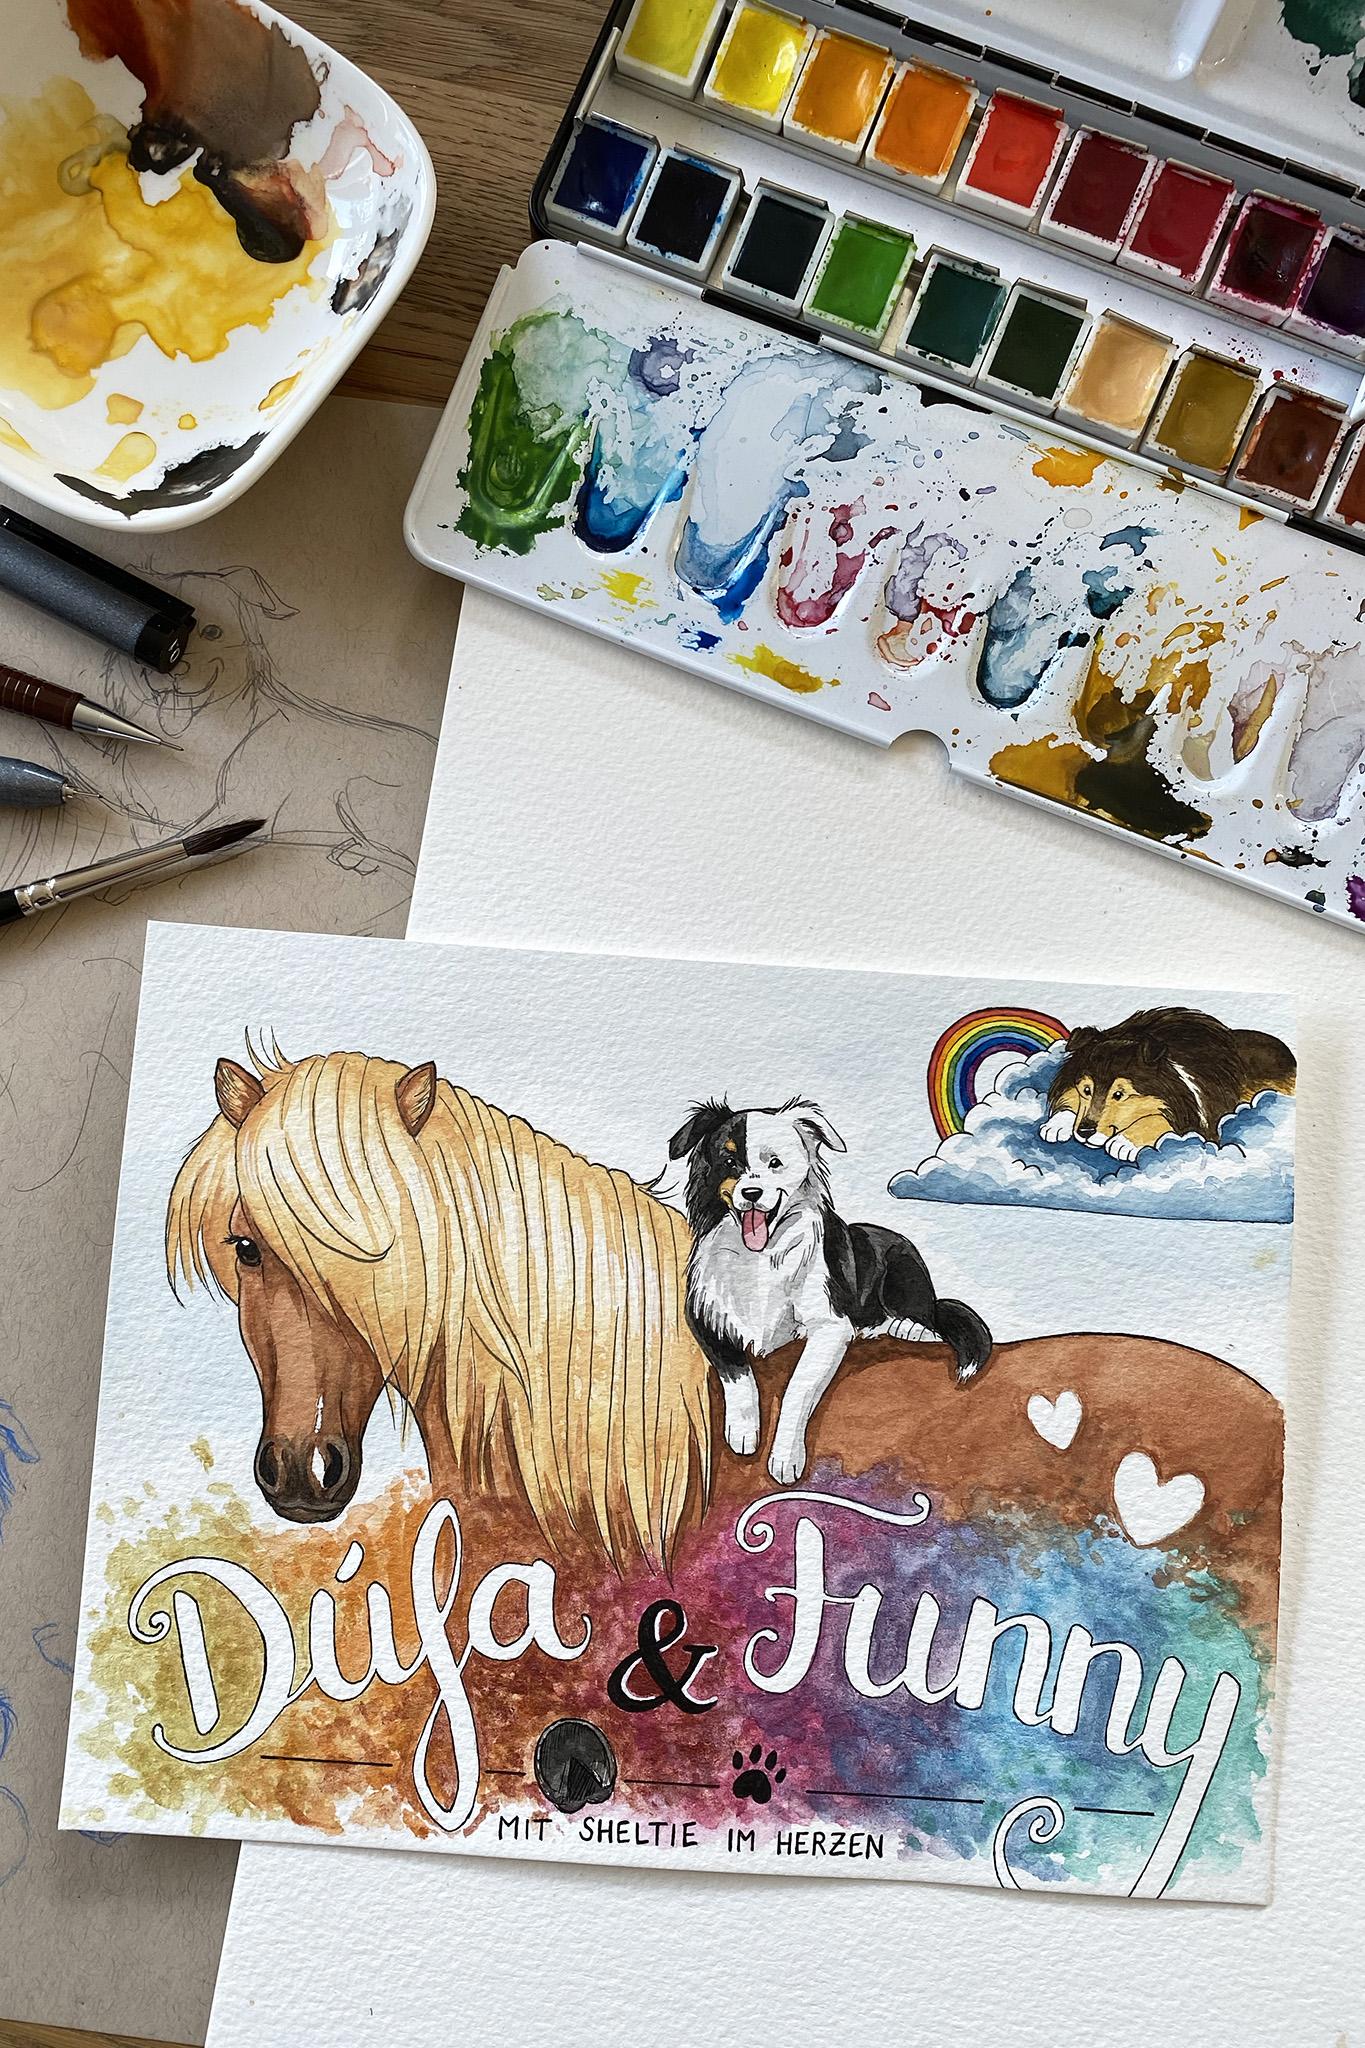 Dúfa, Funny & Sheltie